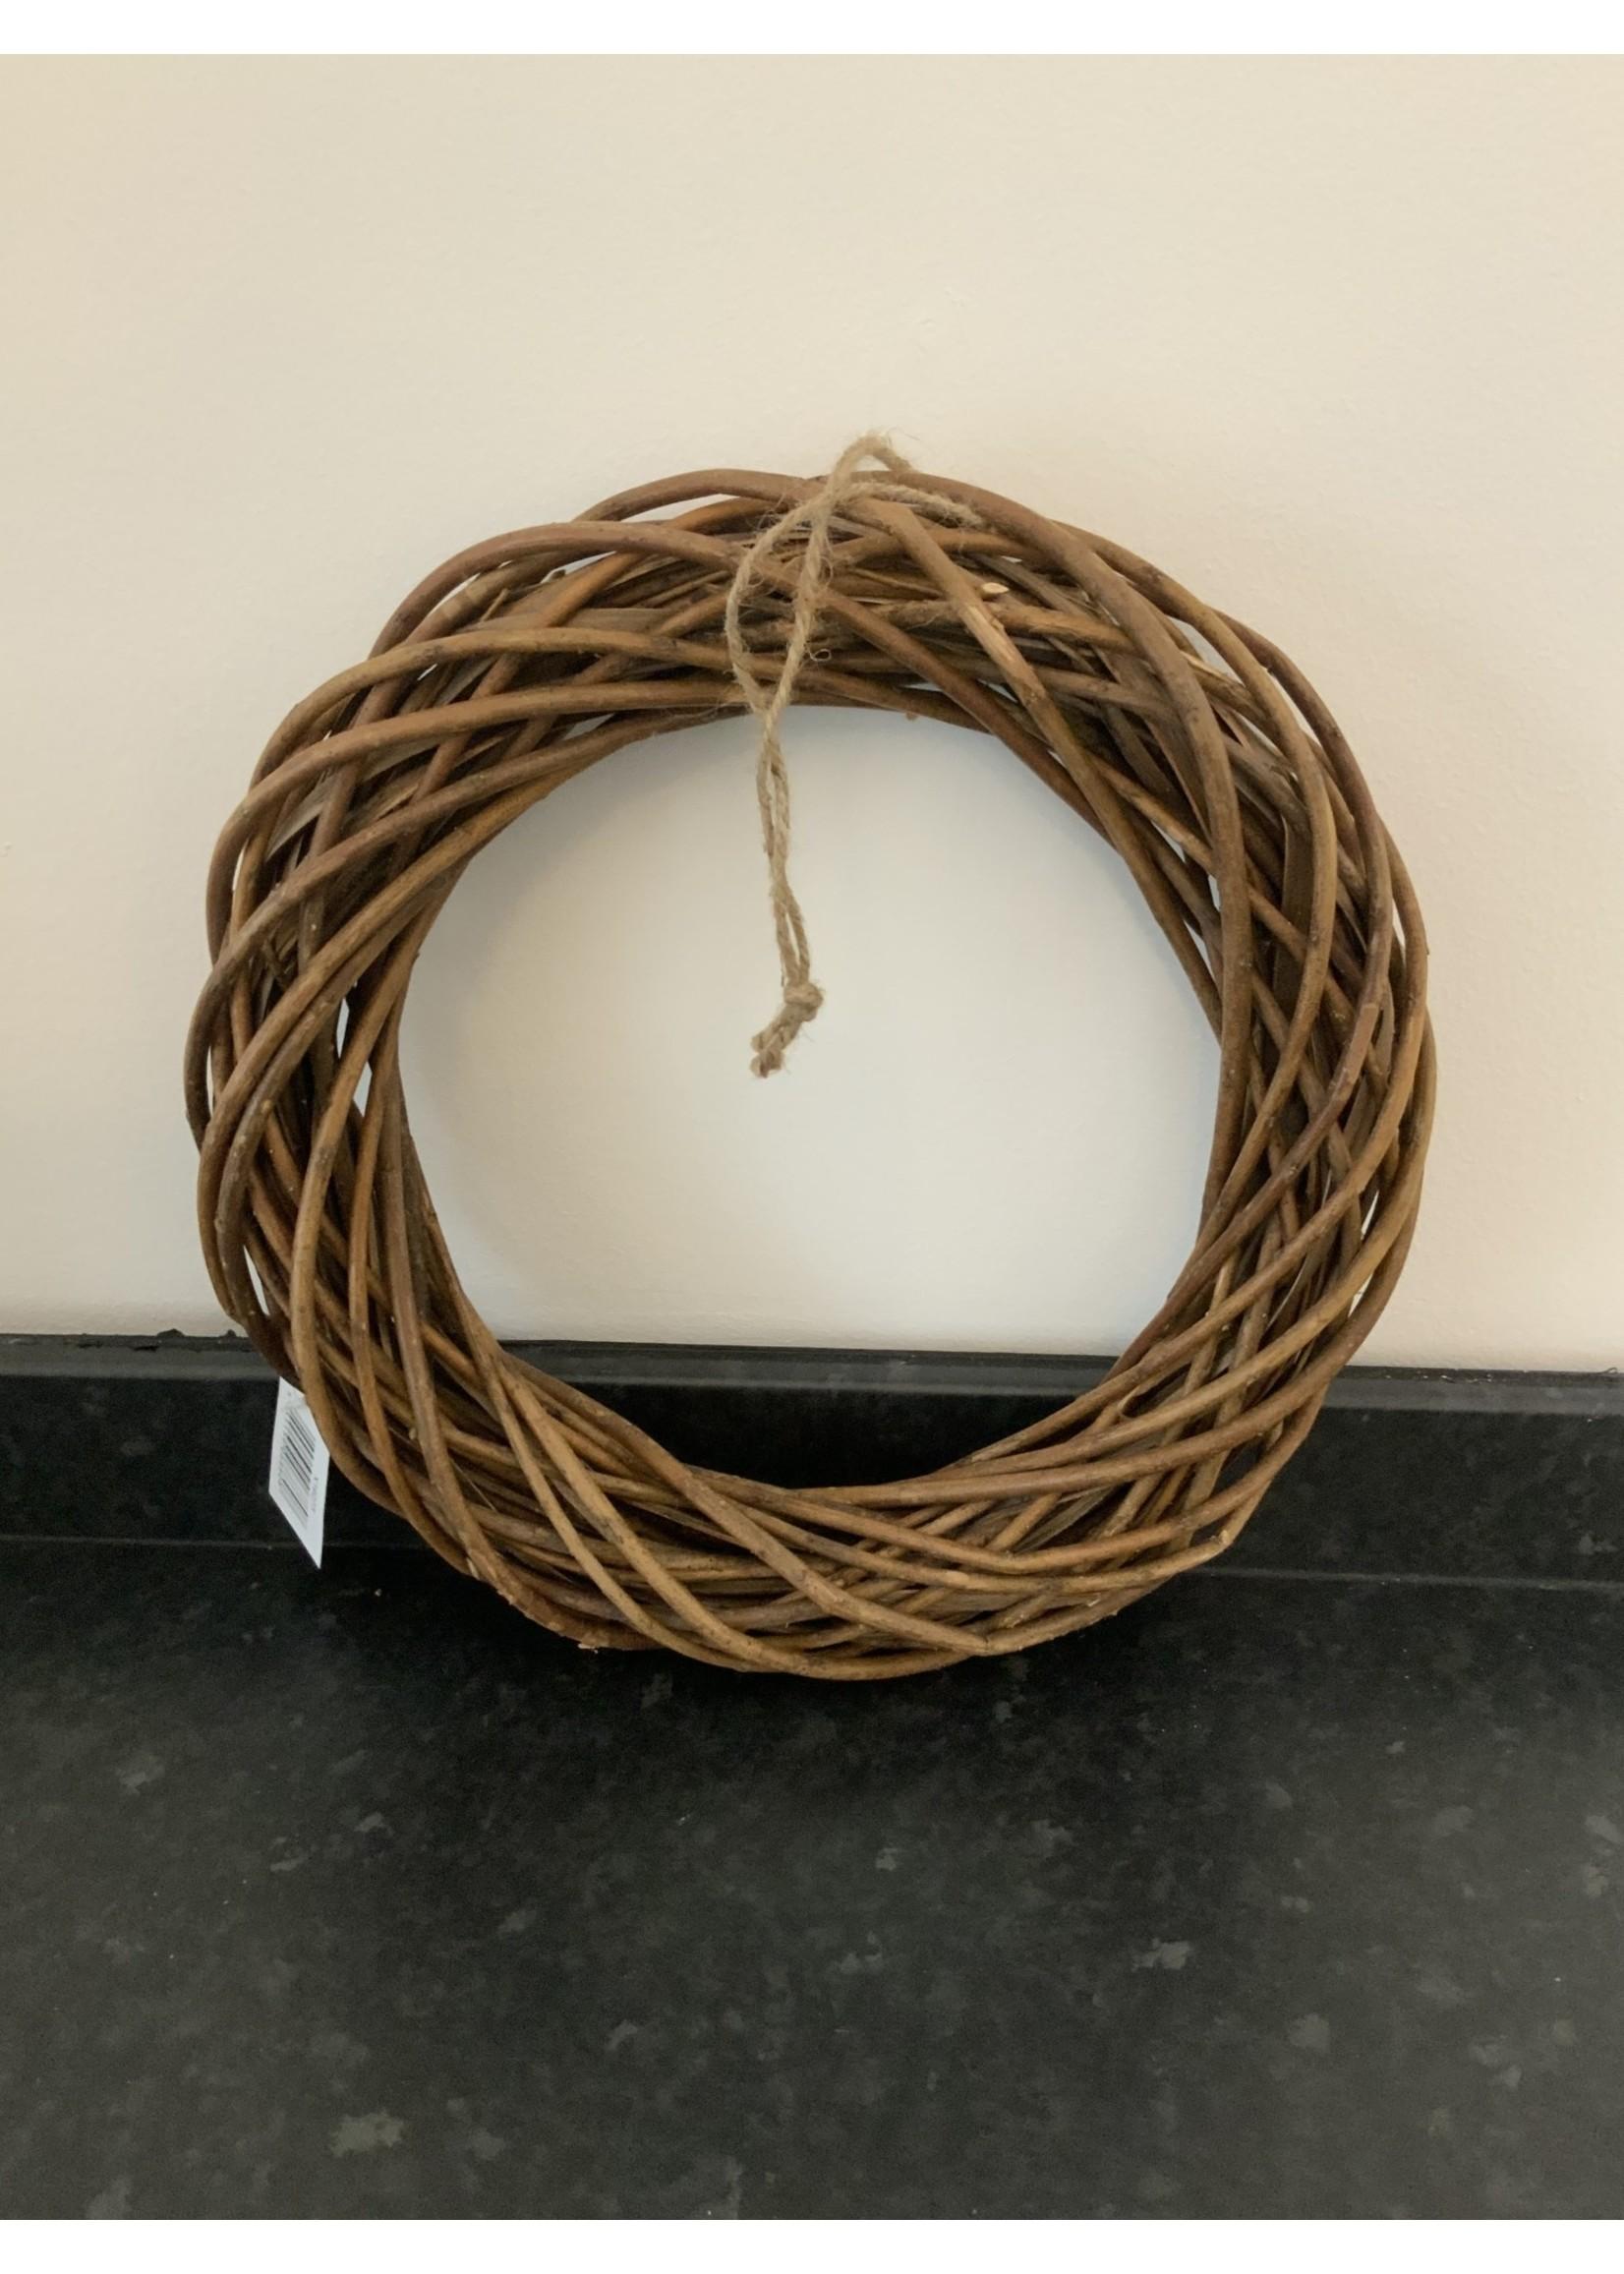 35cm Willow ring